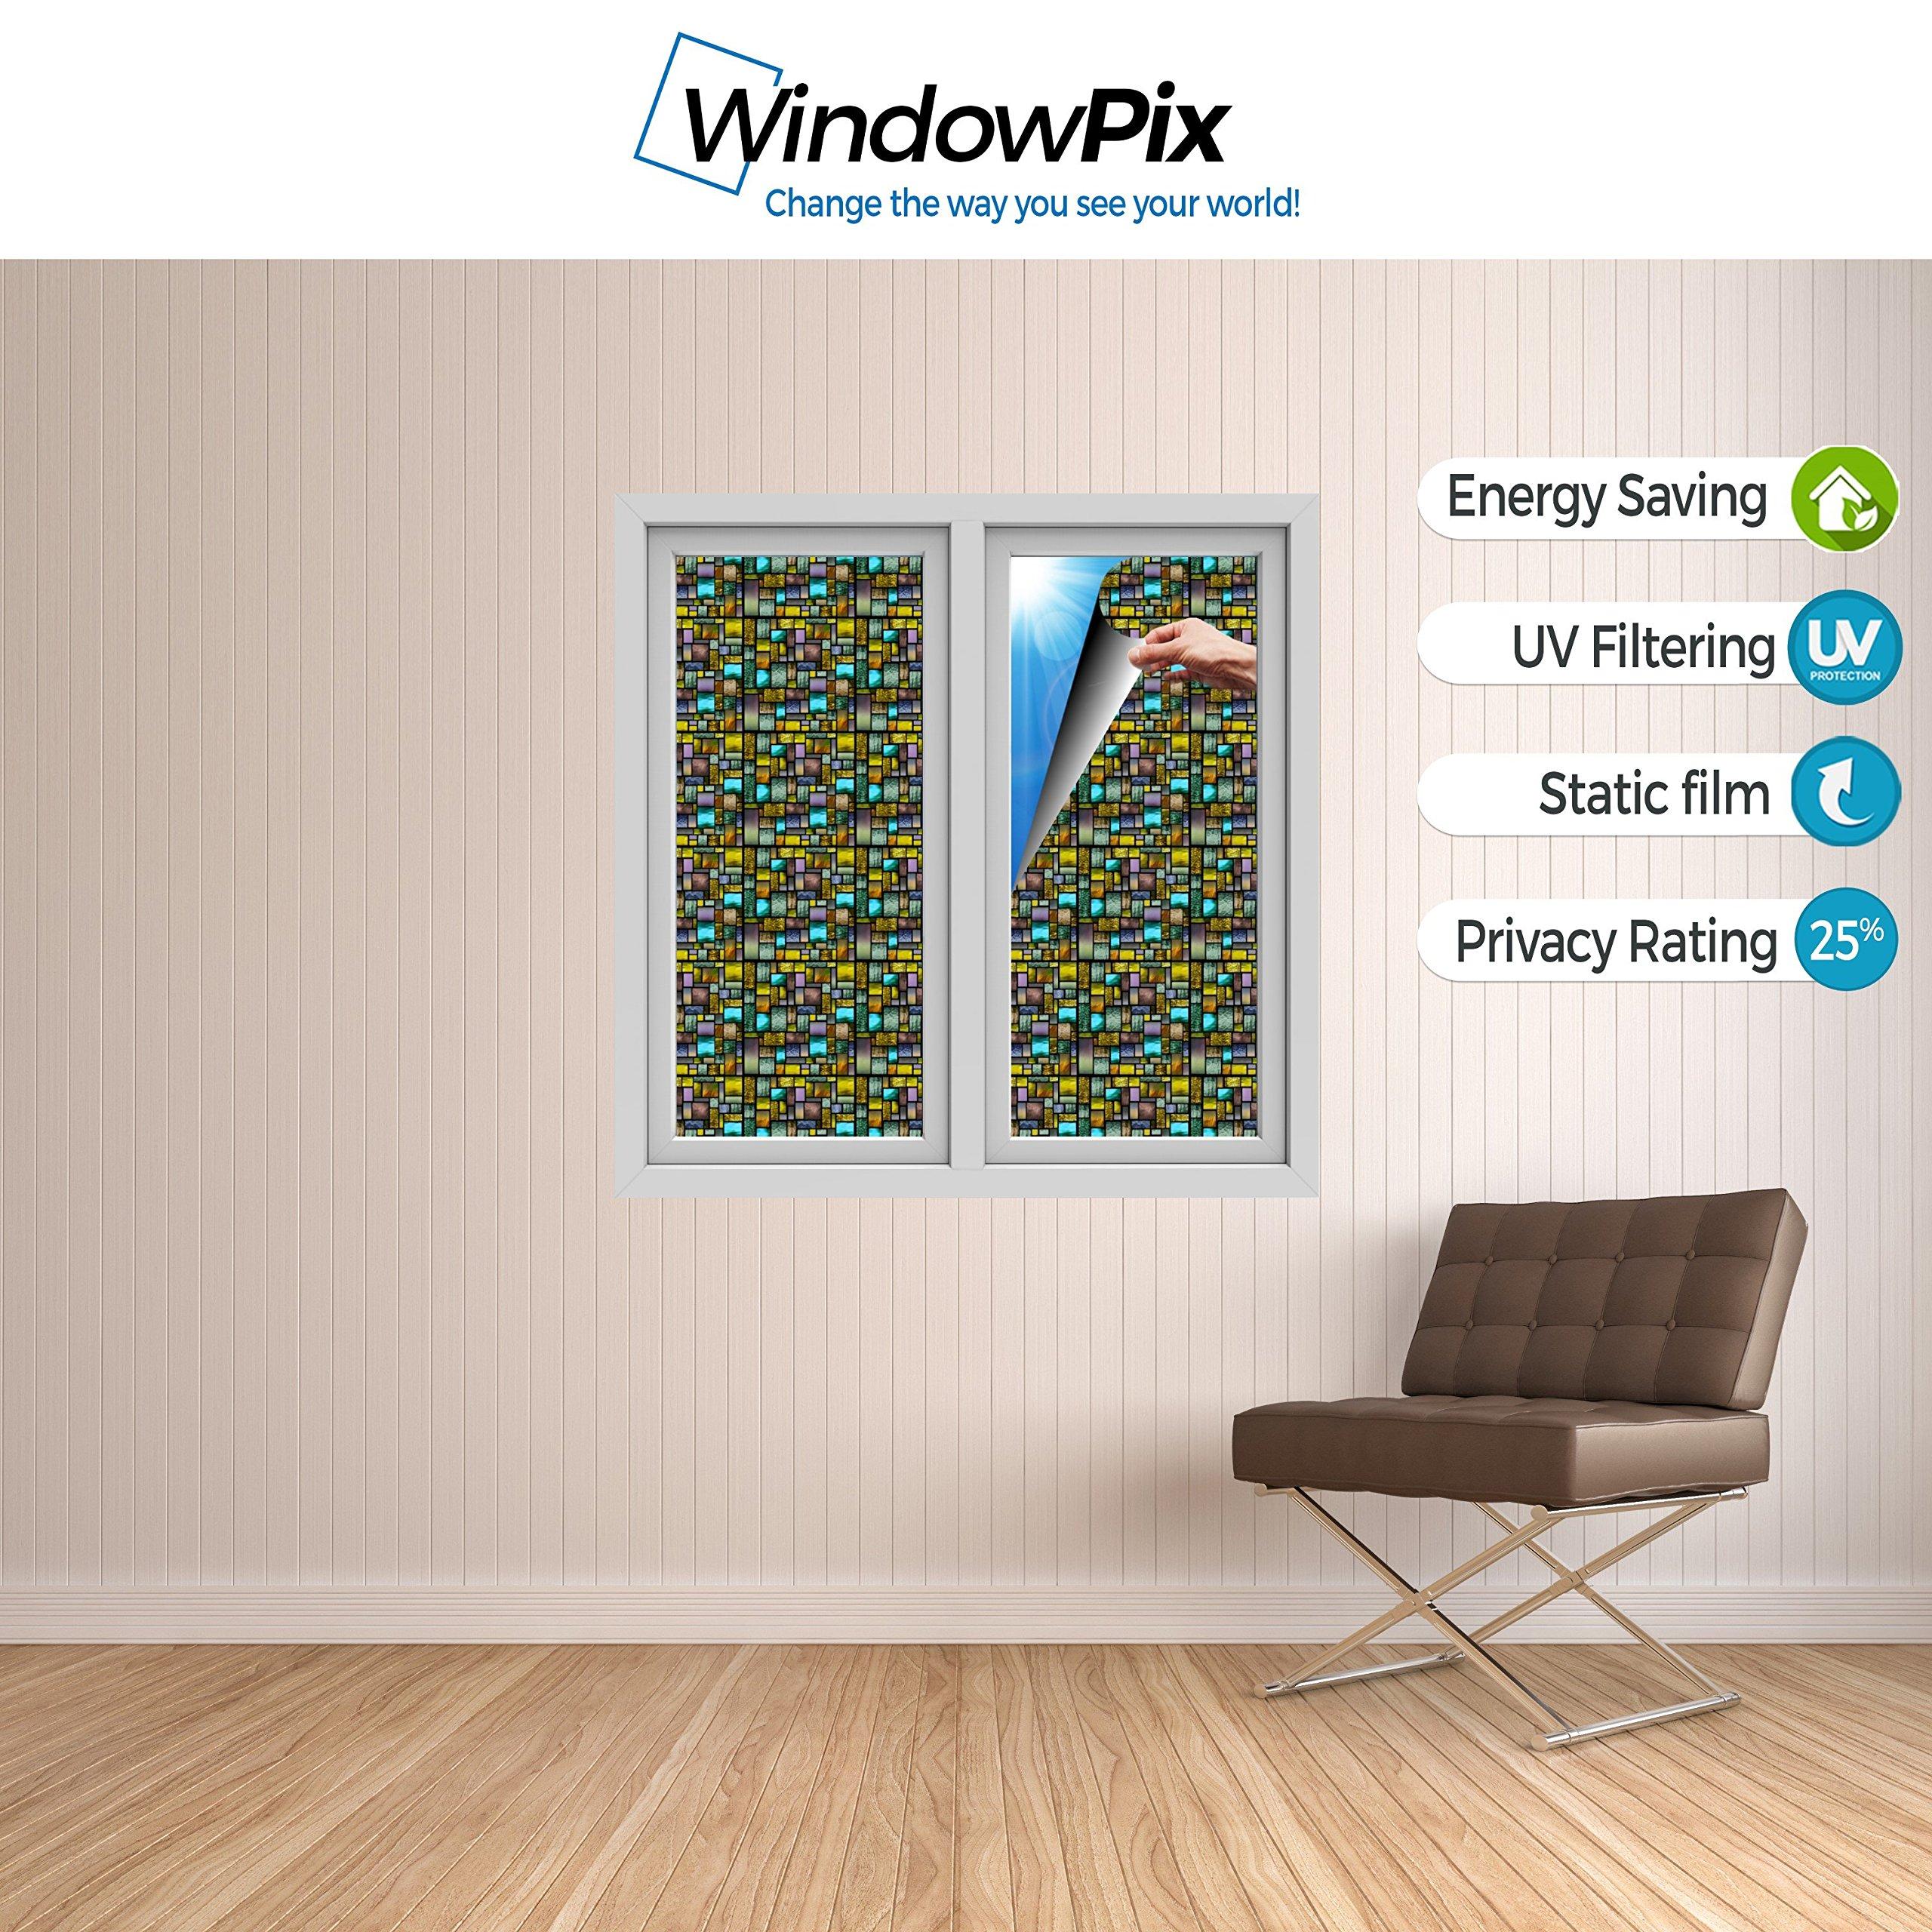 Windowpix WF108-24x96 24x96 Decorative Static Cling Window Film by Windowpix (Image #4)